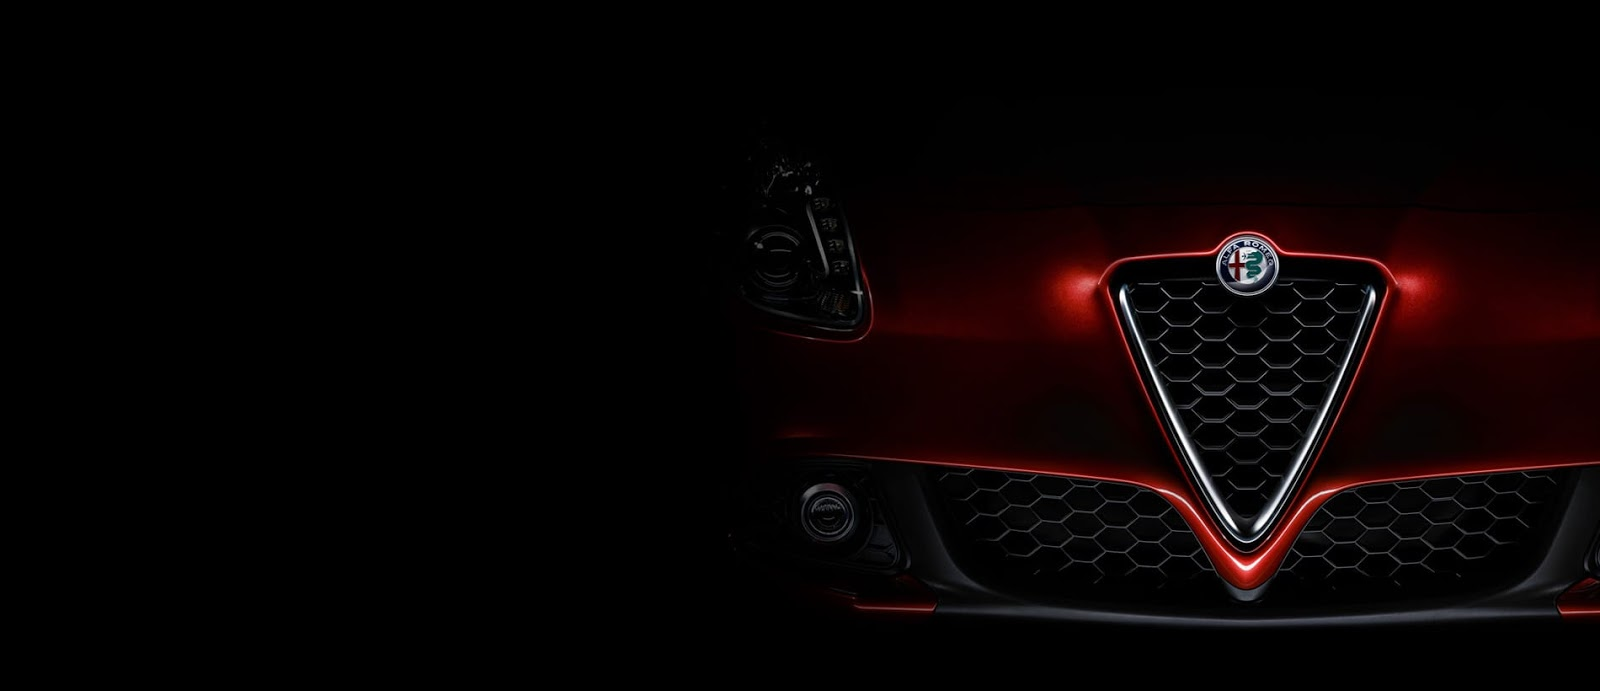 giulietta super style Νέα έκδοση Alfa Romeo Giulietta SUPER, με SUPER τιμή!